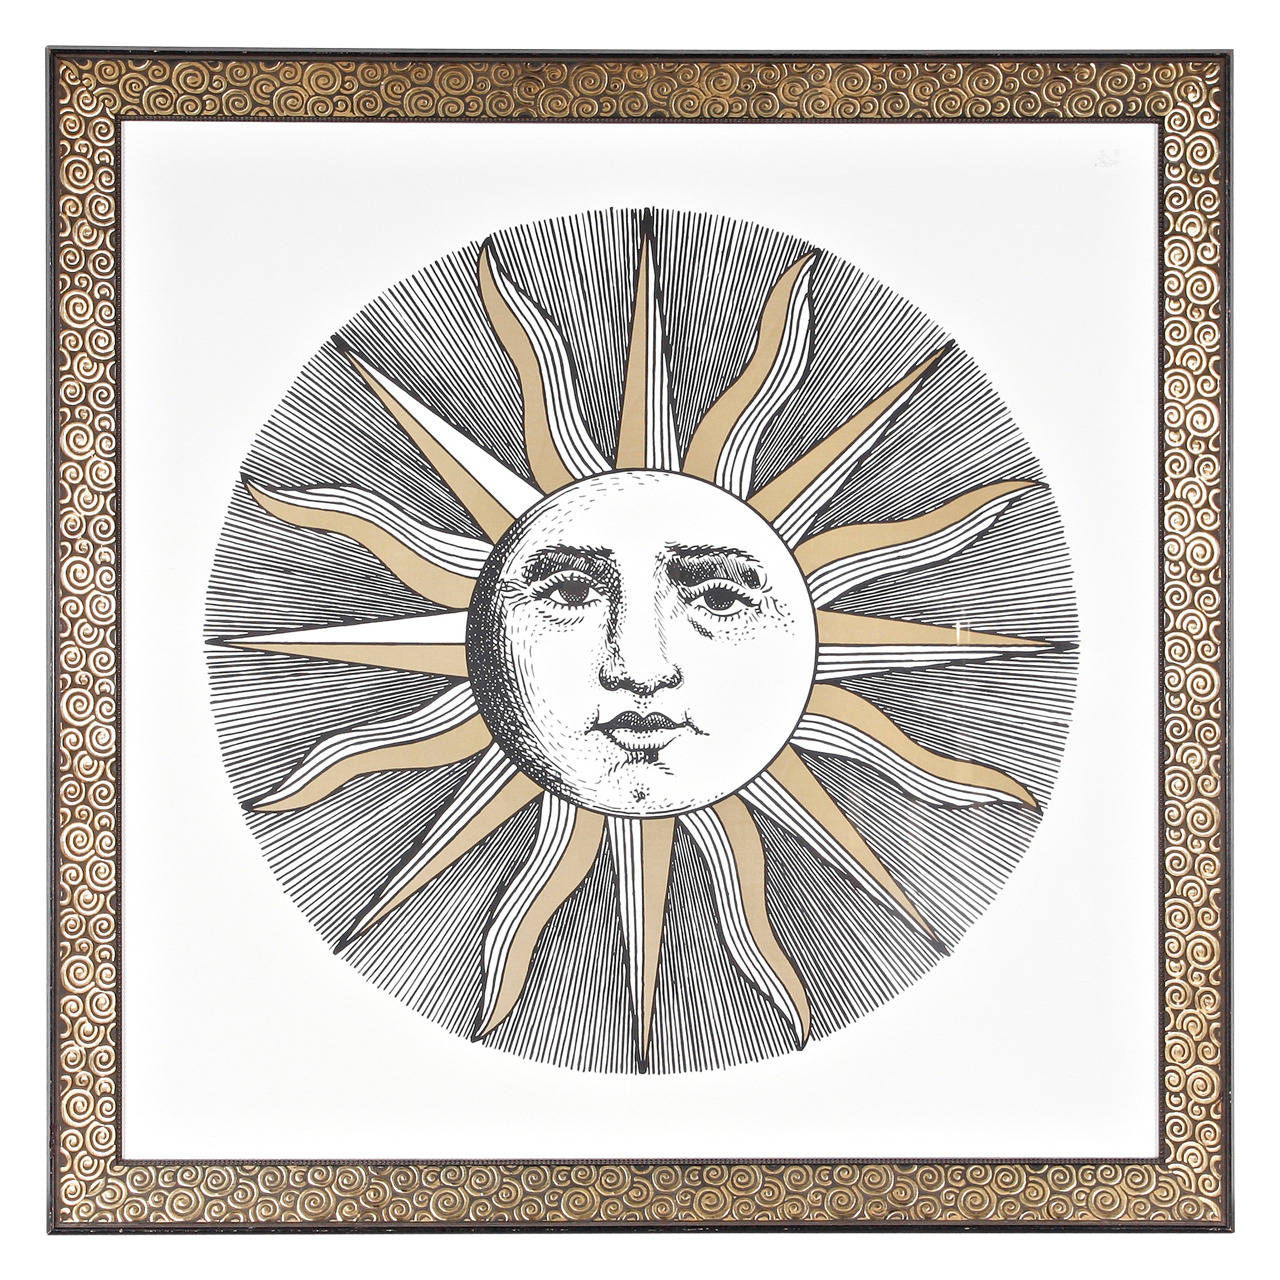 Fornasetti Art Prints Fornasetti Large Silkscreen Poster For Sale At 1stdibs